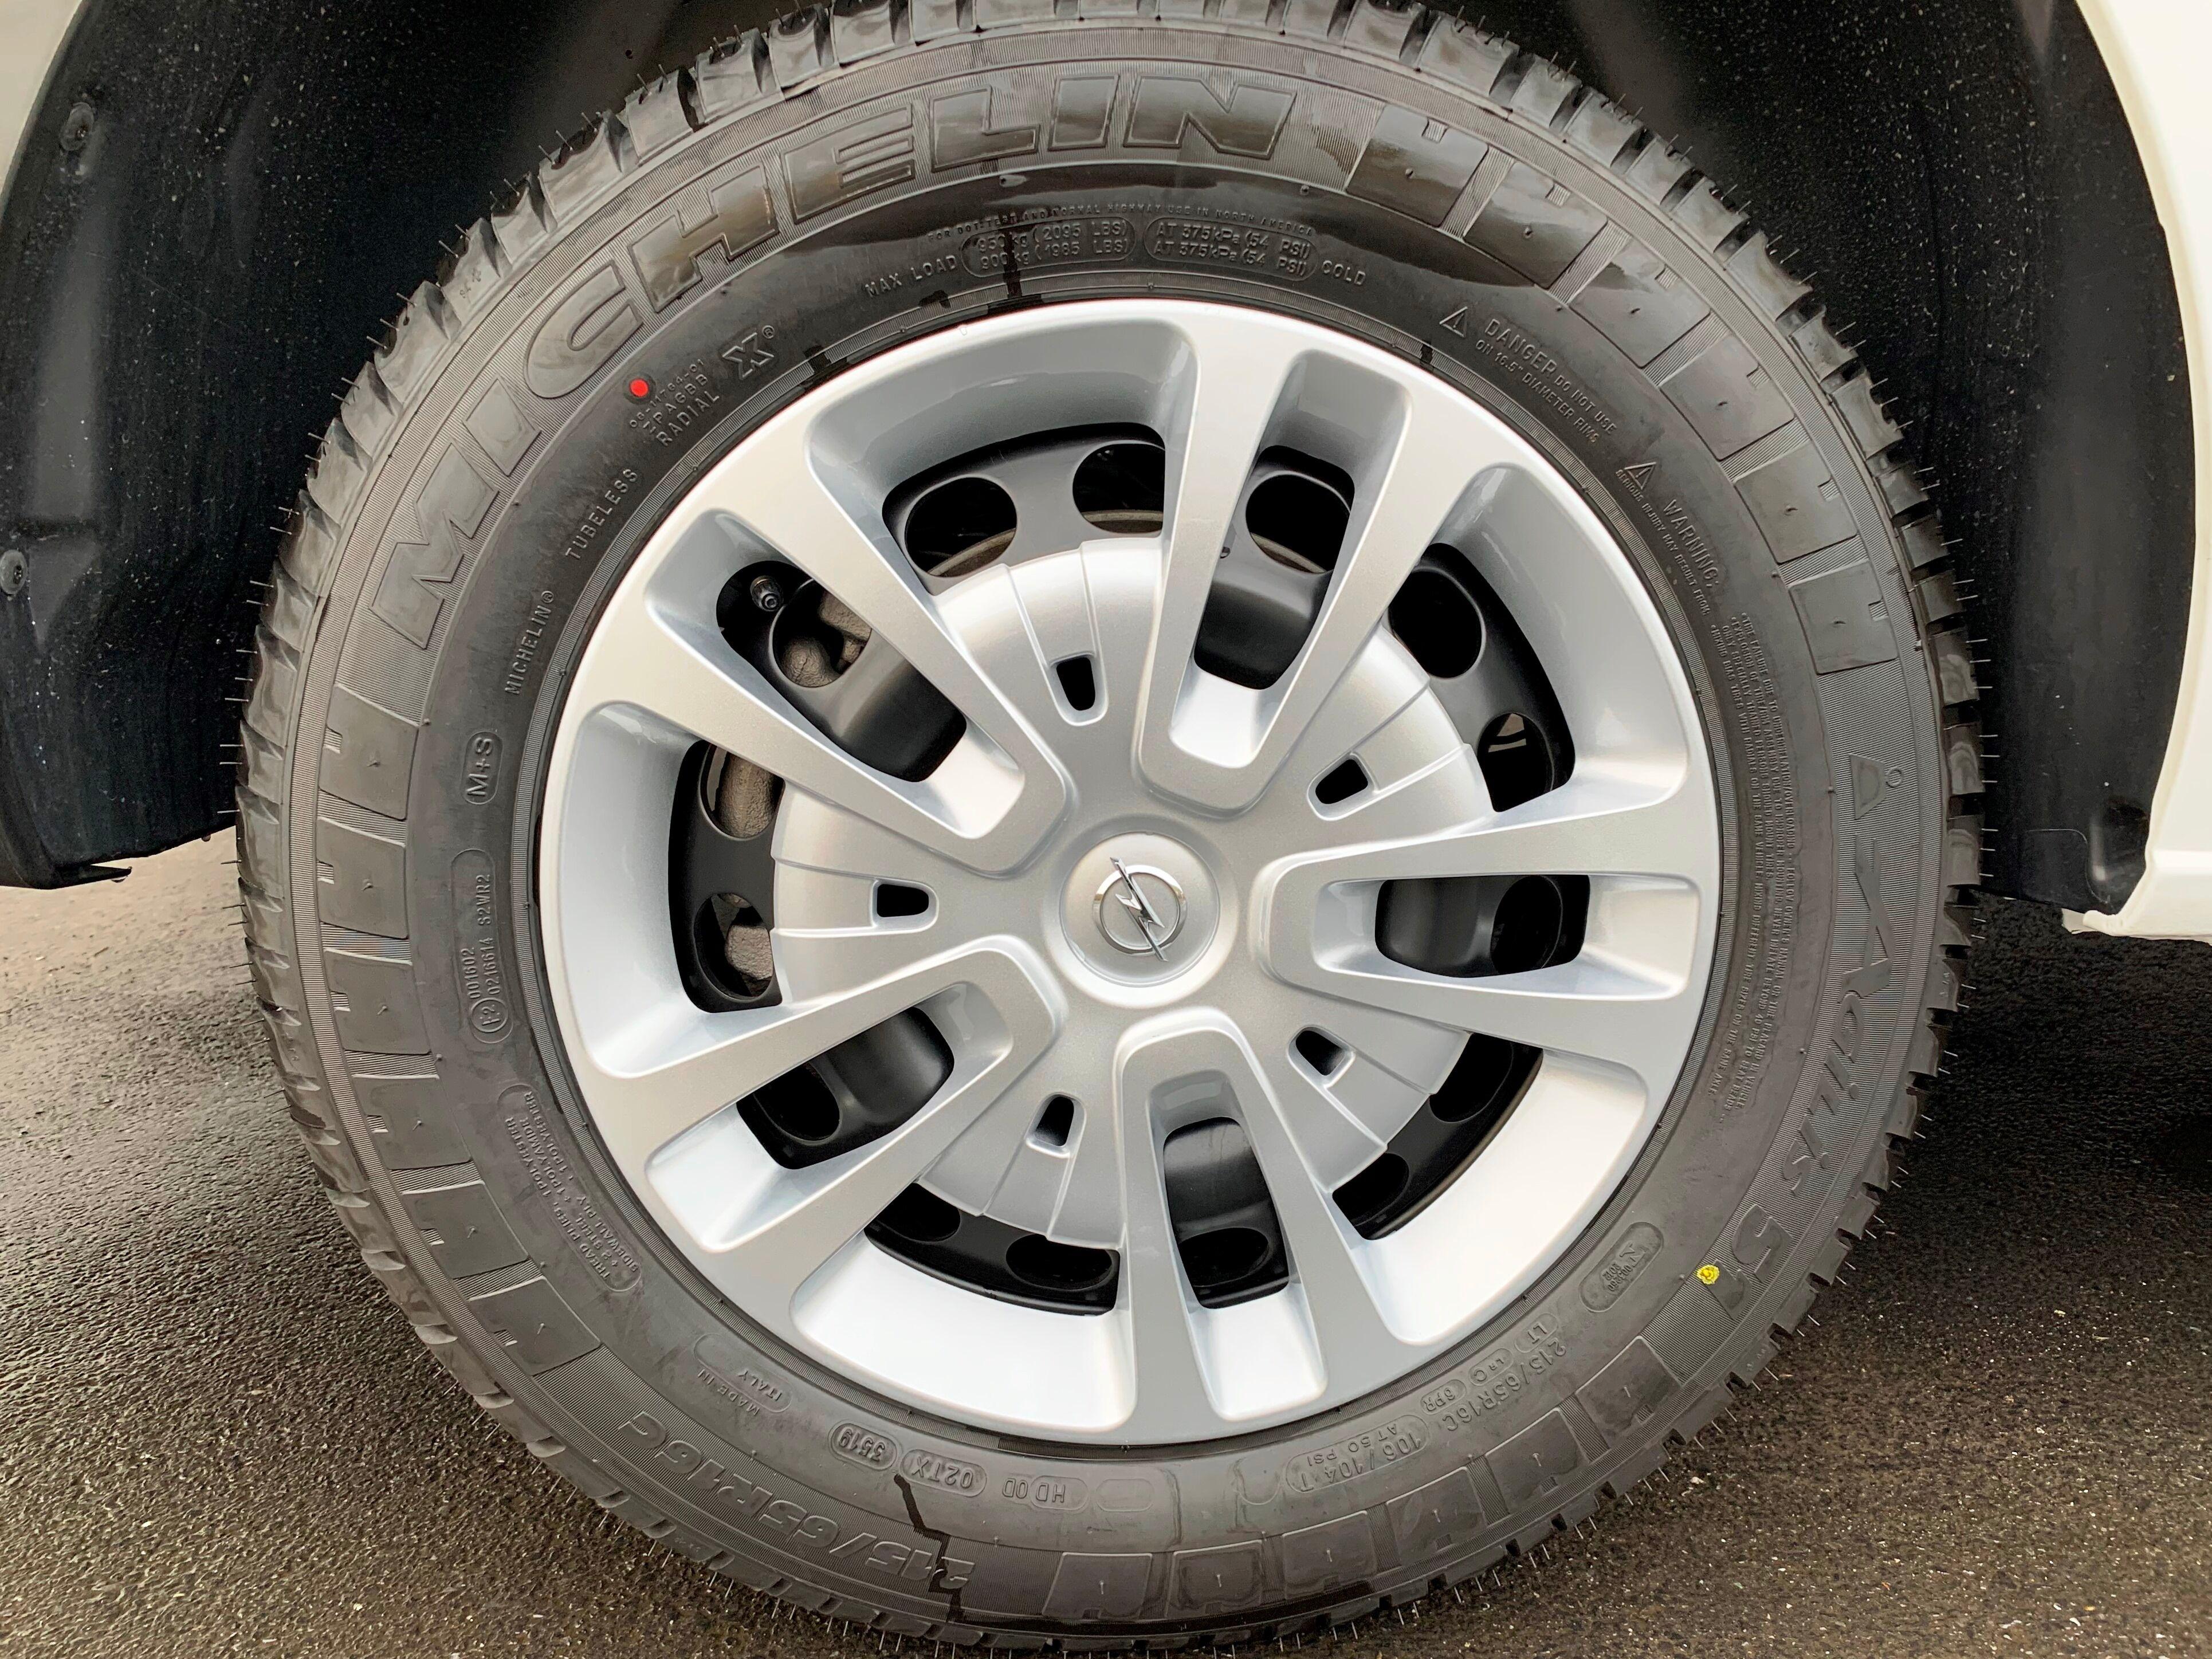 Opel Vivaro 2.0D 122PK Edition L3H1 NIEUW in stock 35% korting 13/29